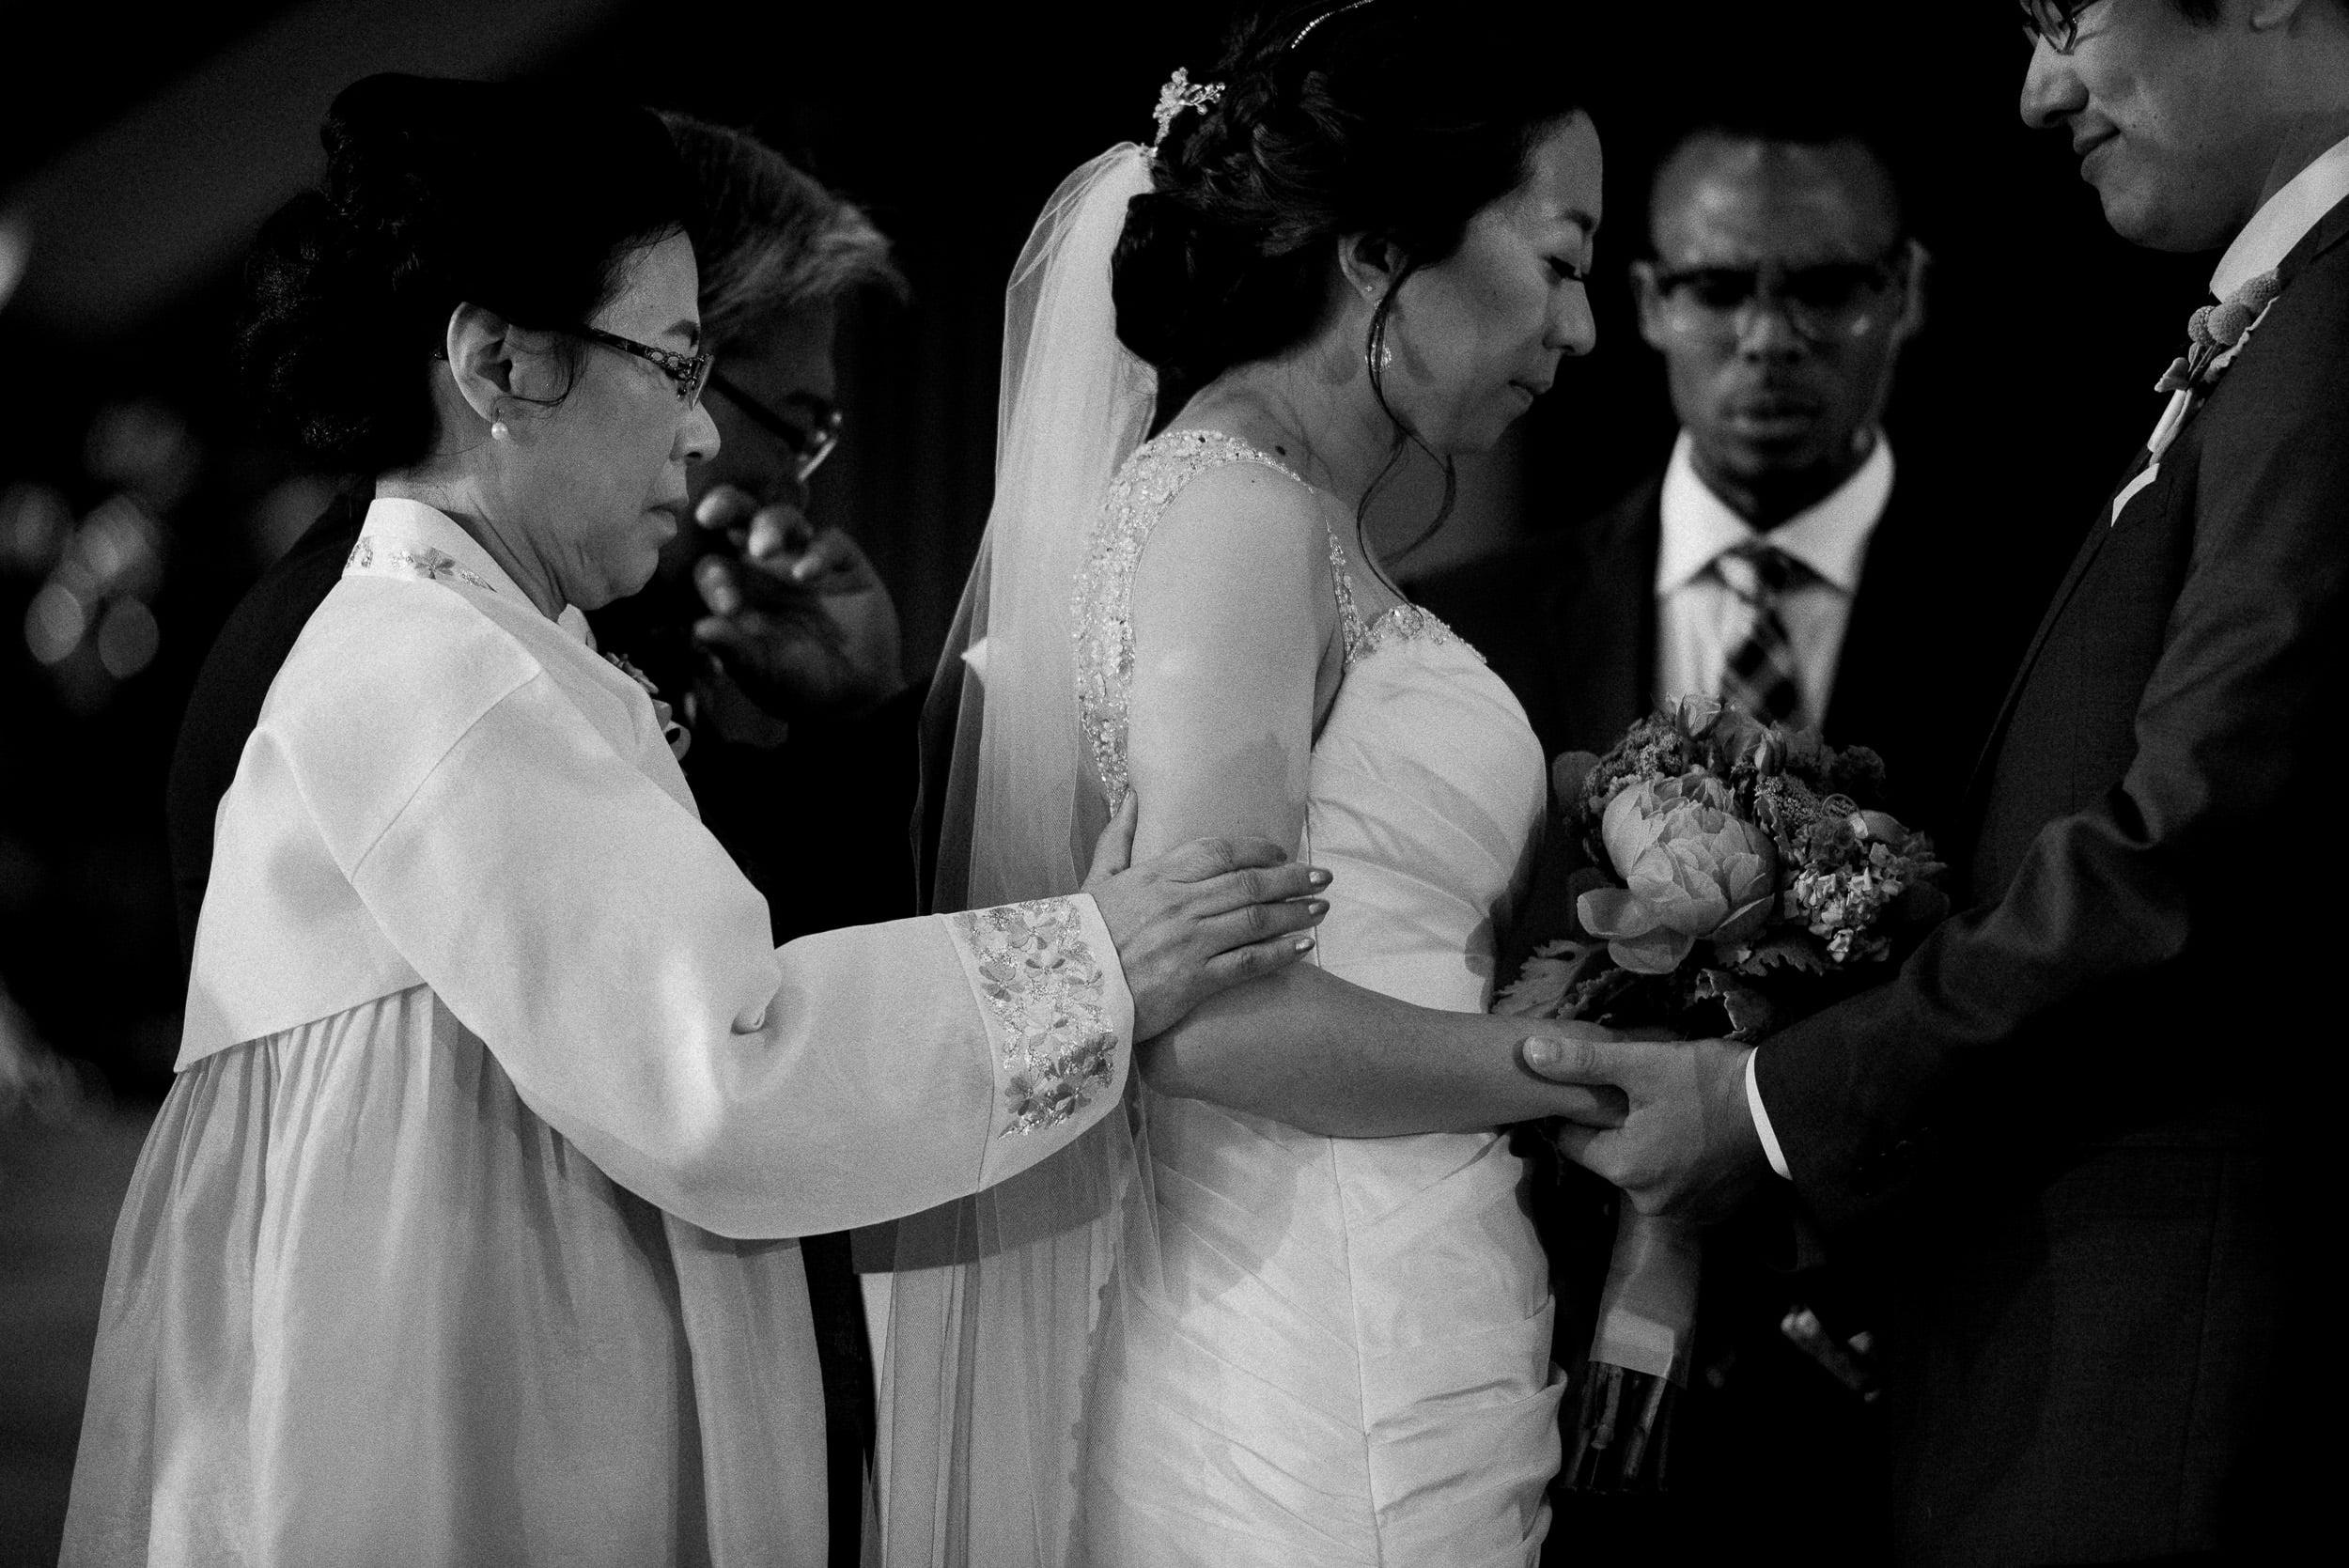 Moraga Valley Church wedding 049.jpg